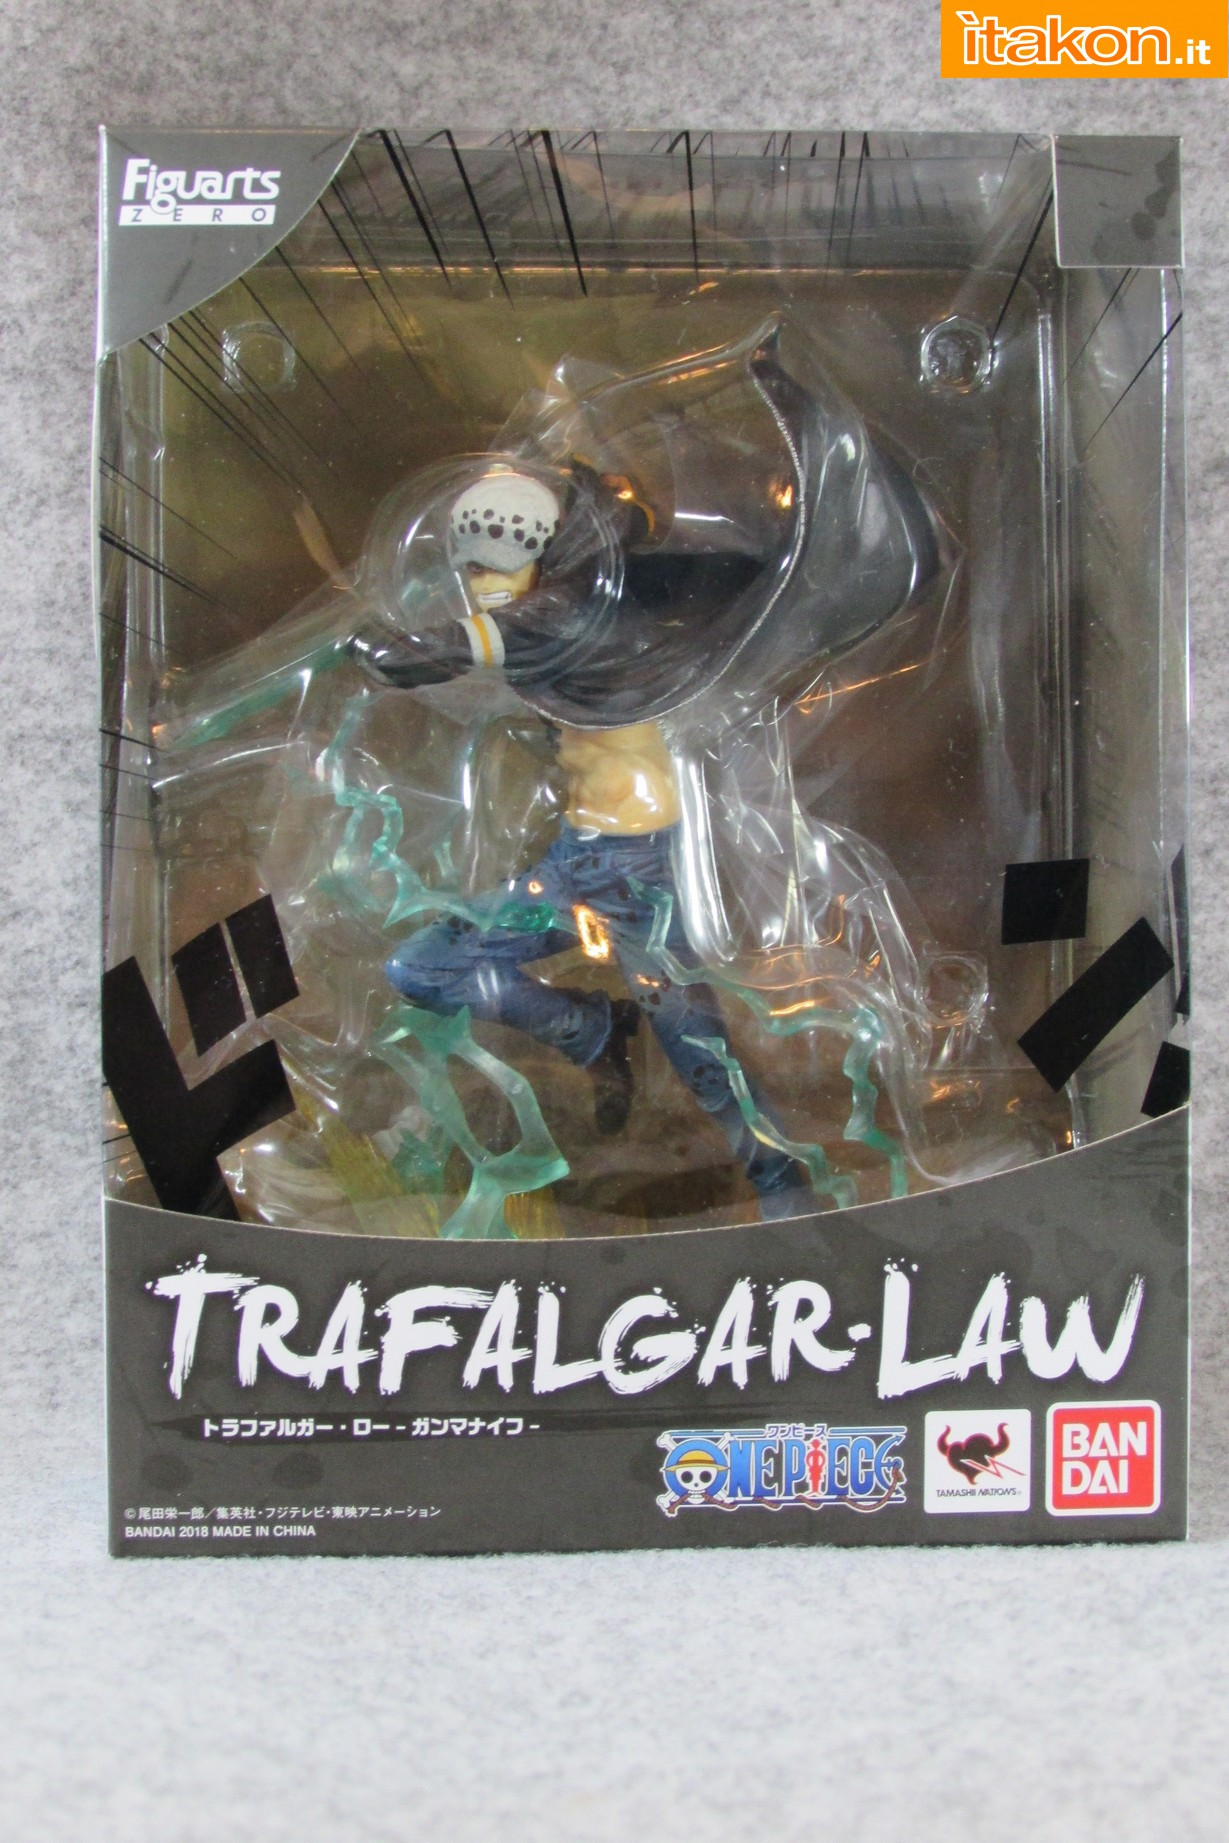 Link a One Piece Trafalgar Law Gamma Knife Figuarts ZERO Chou Gekisen Extra Battle Recensione Review Itakon.it 02